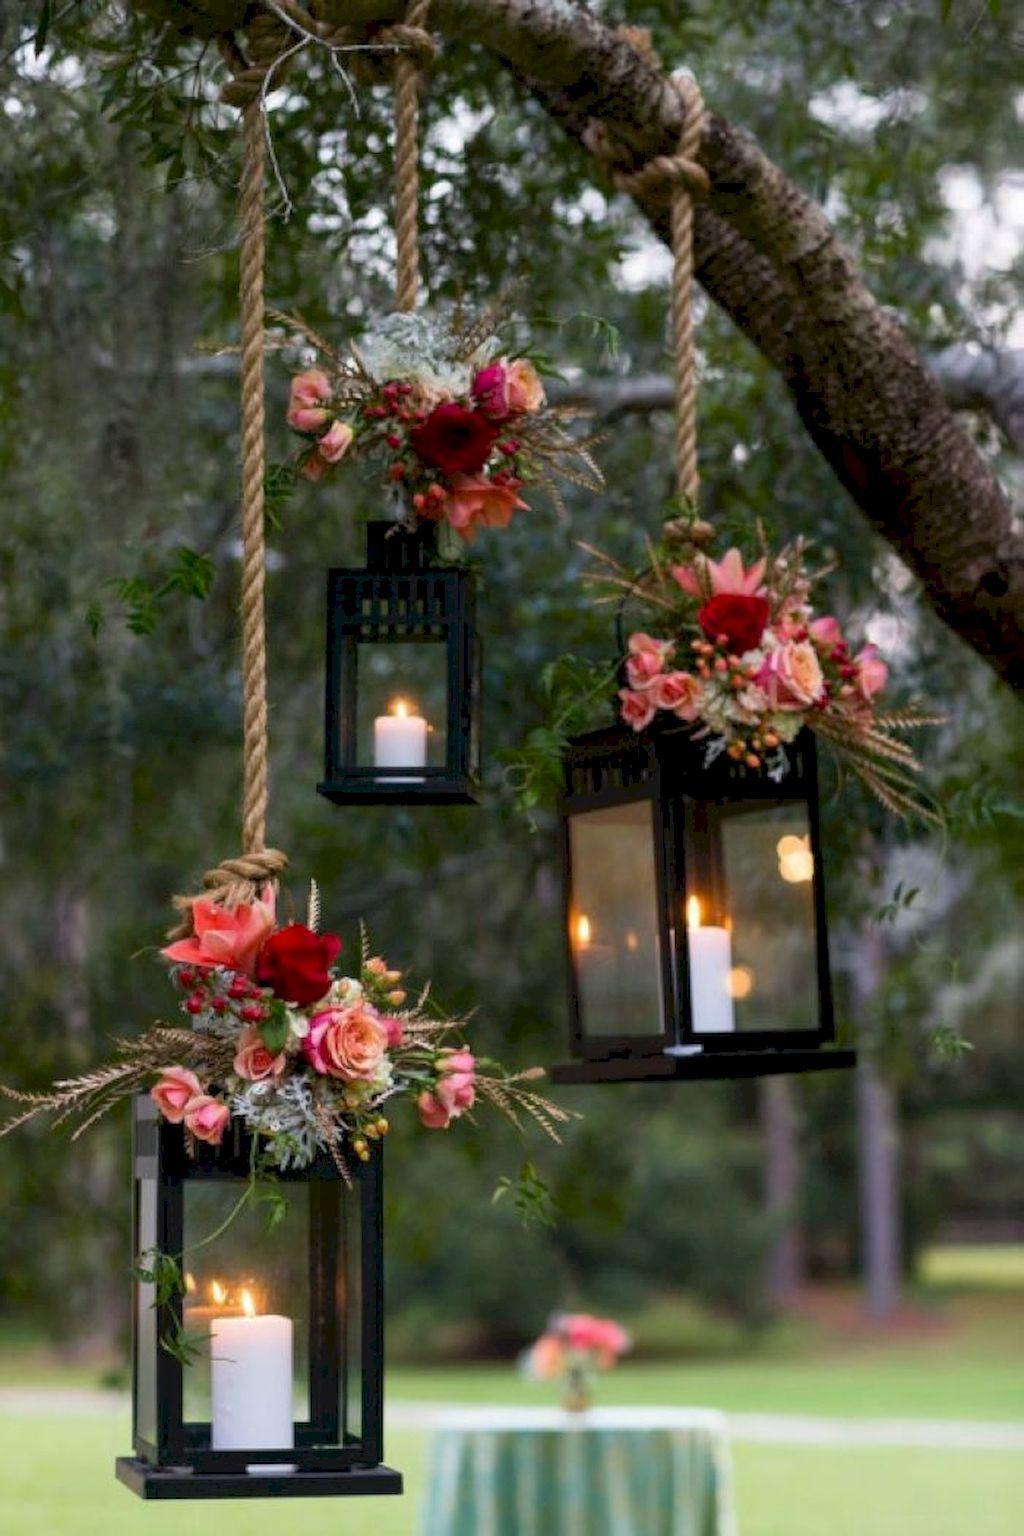 Outdoor garden wedding decoration ideas   Stunning Romantic Backyard Garden Ideas on A Budget  Romantic